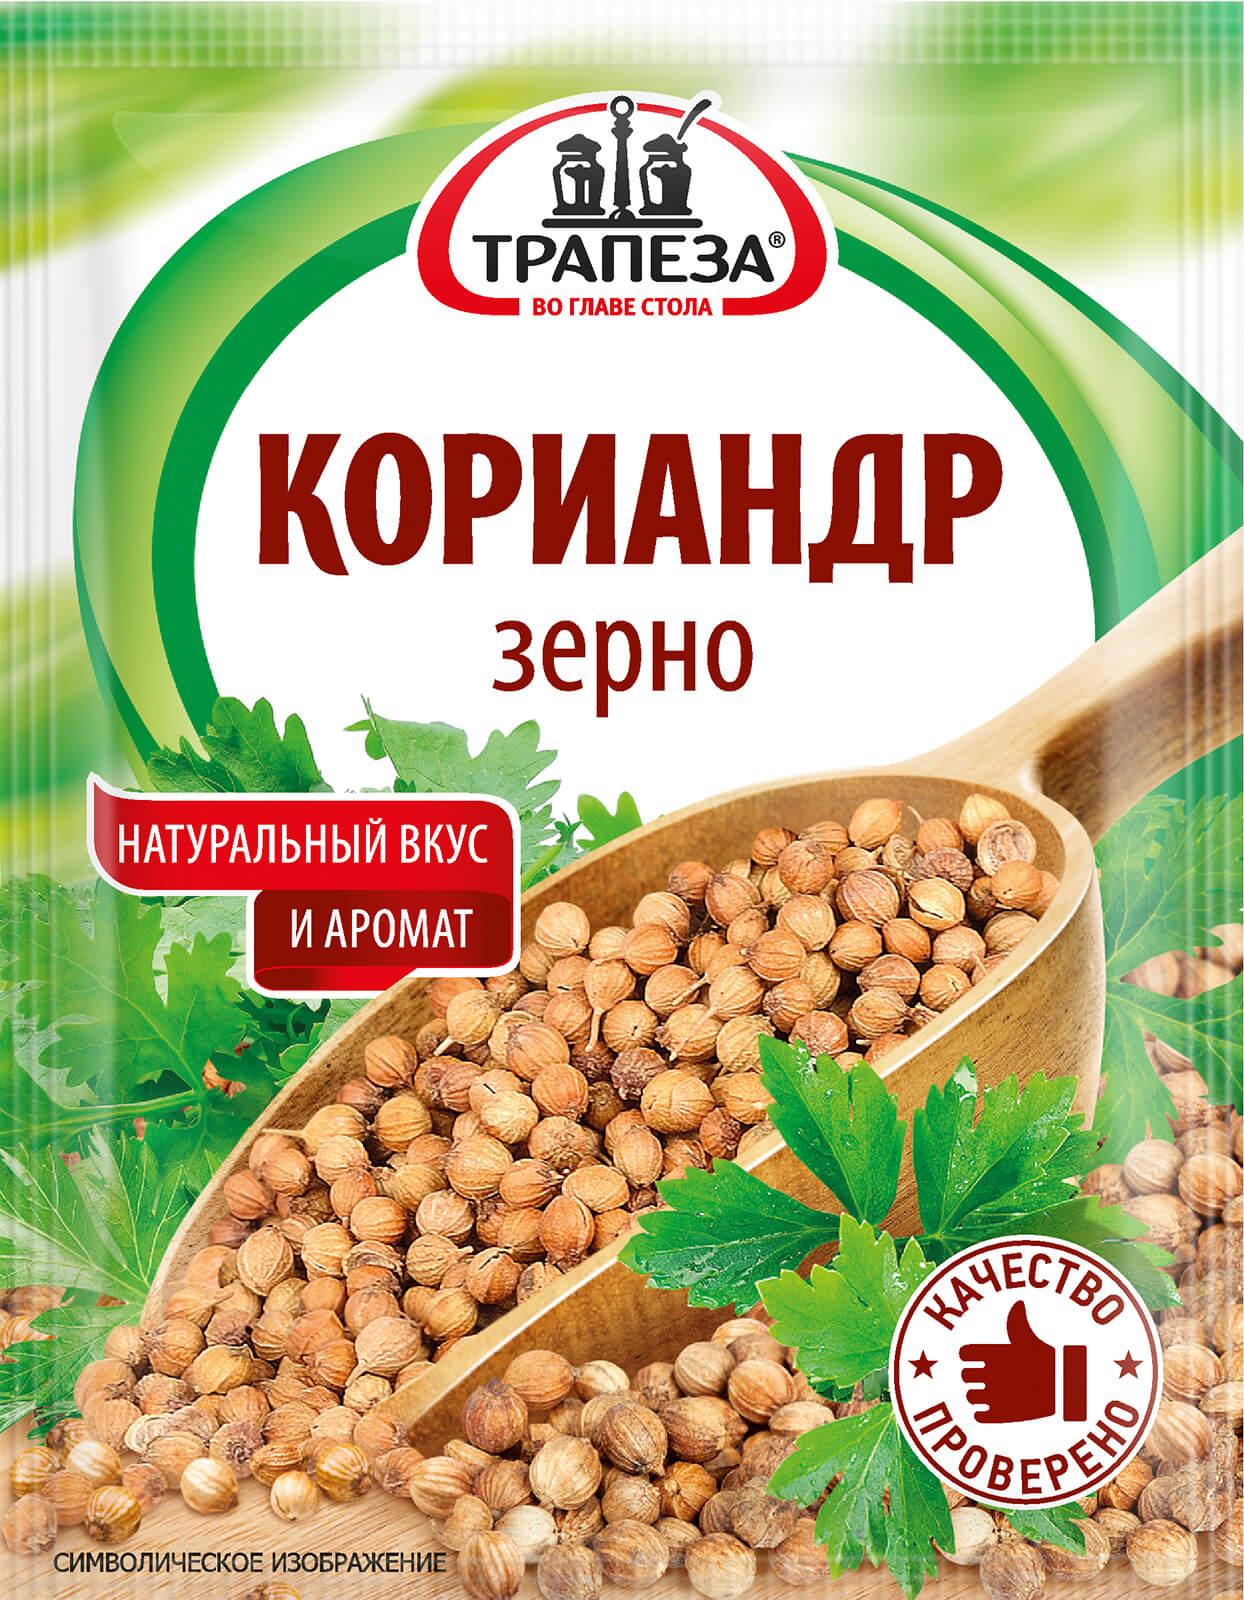 Кориандр зерно Трапеза